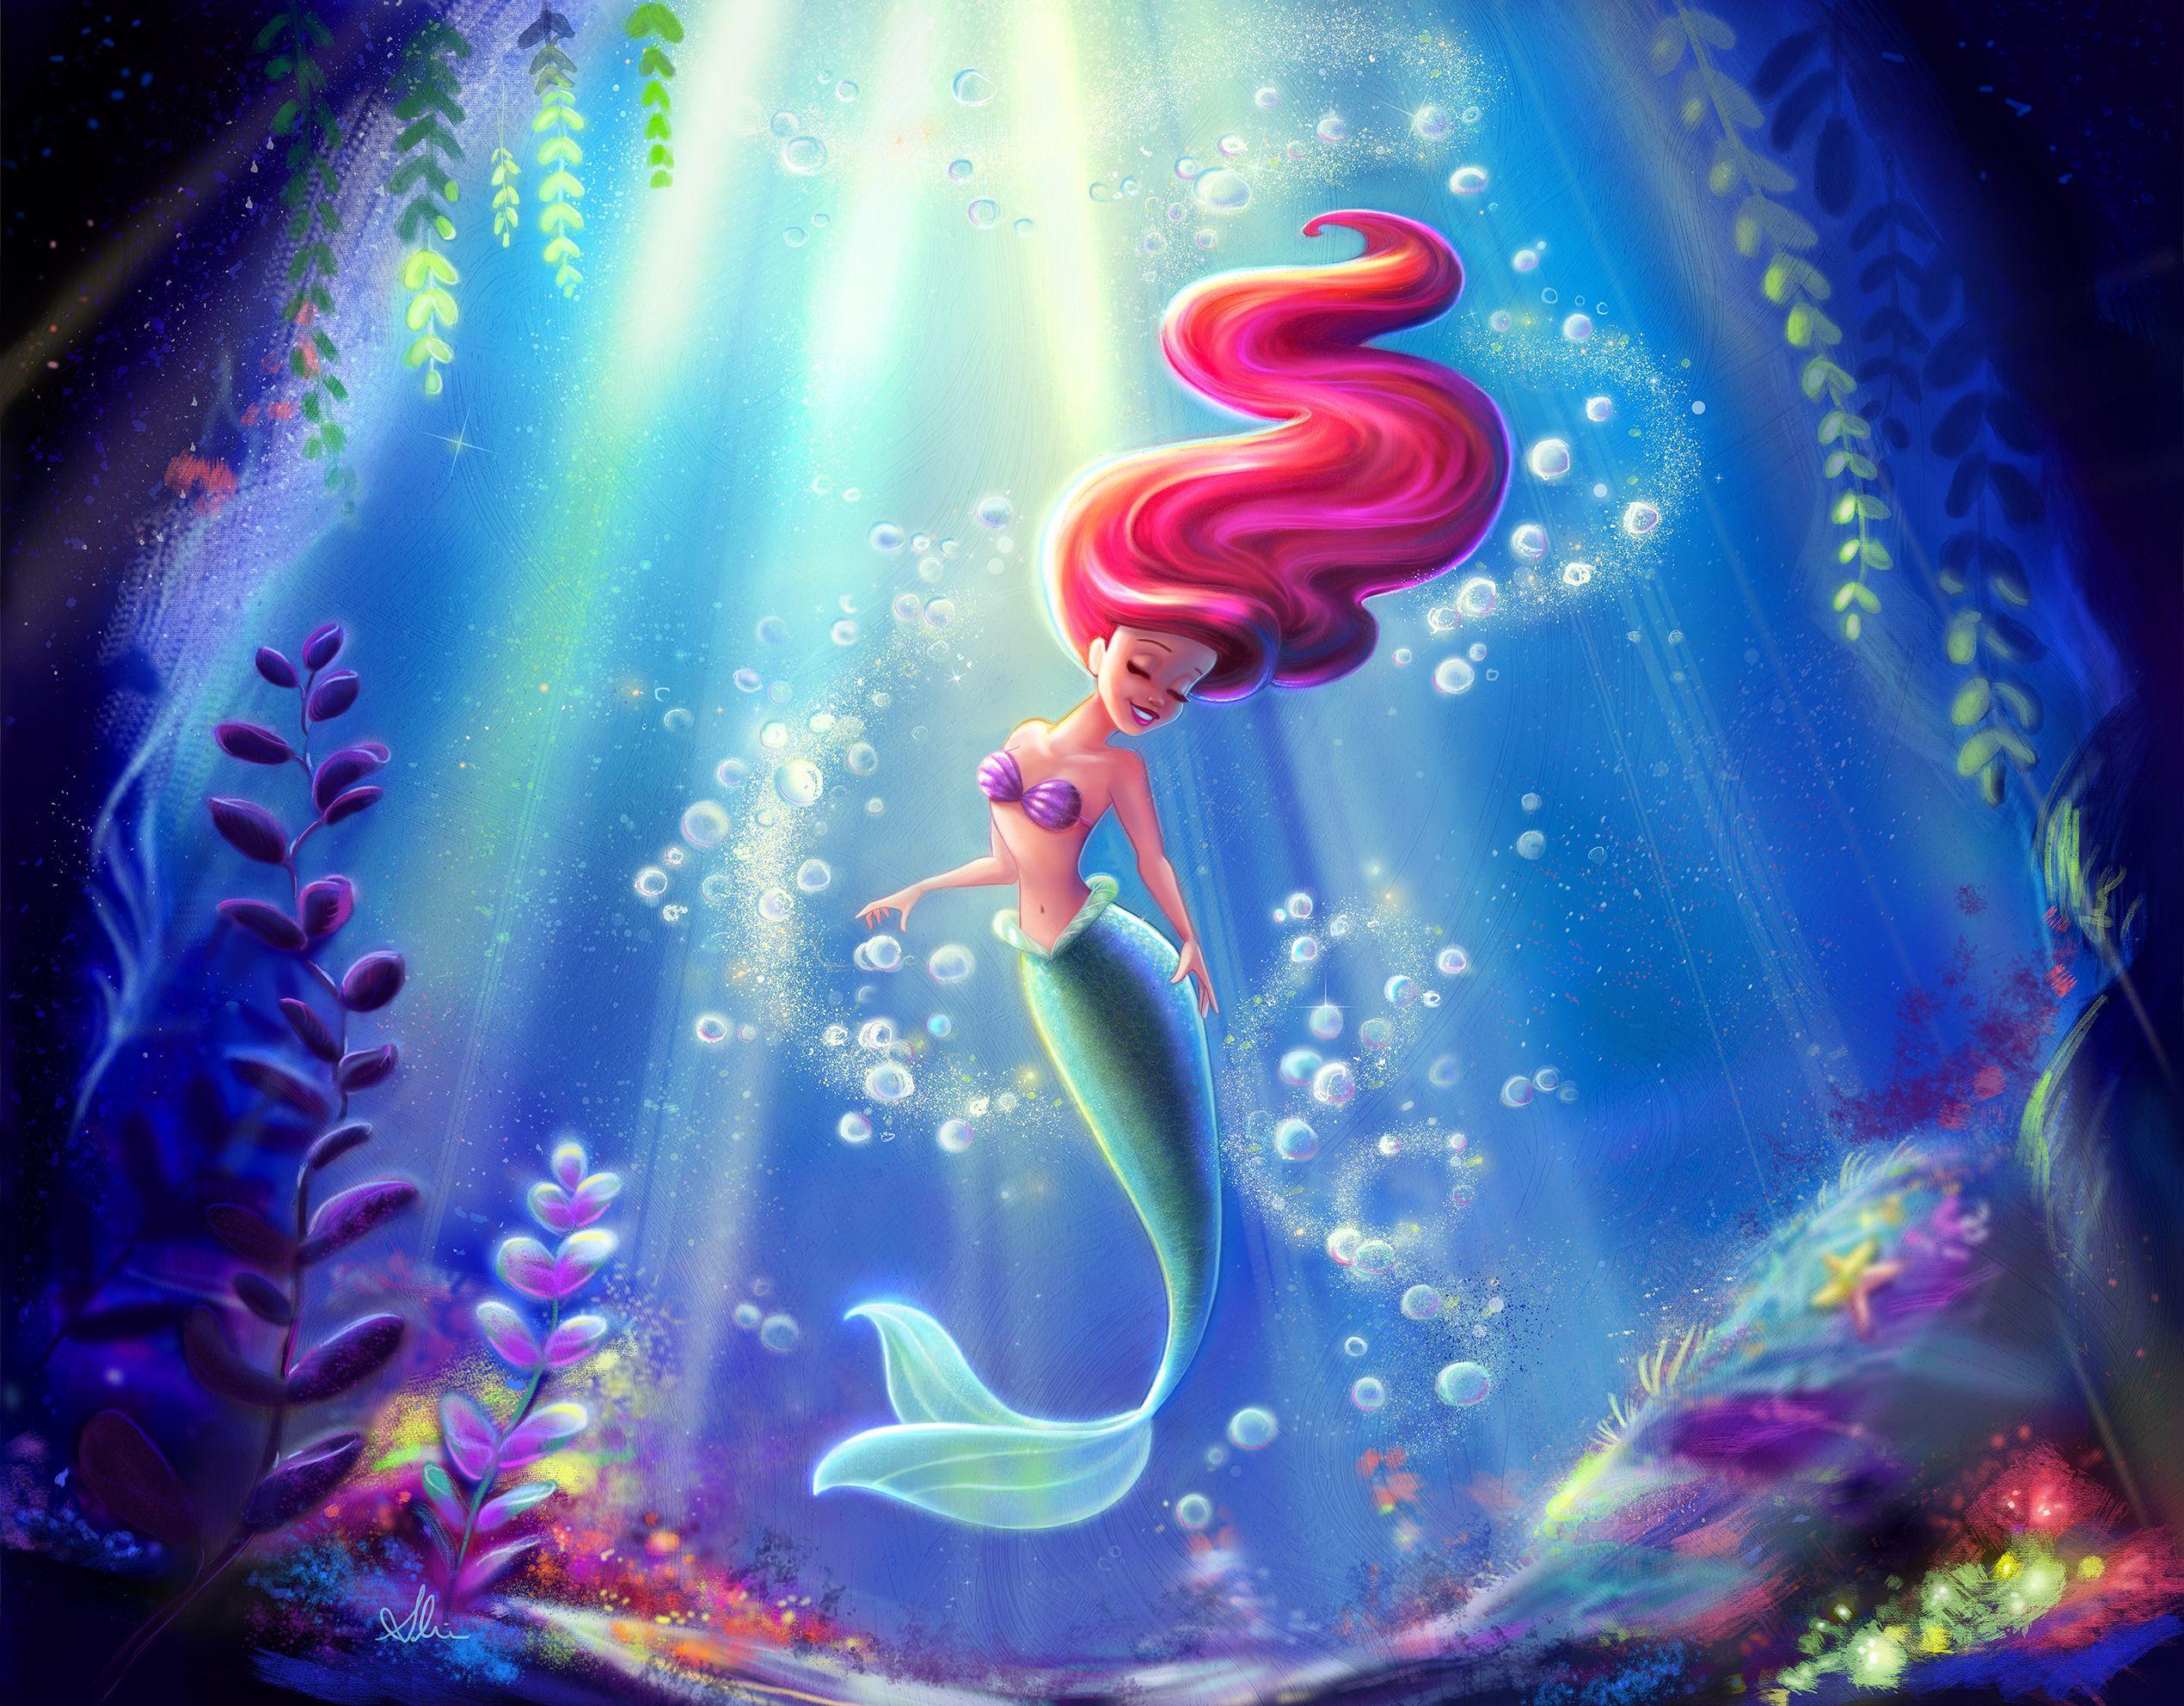 The Little Mermaid Wallpapers Top Free The Little Mermaid